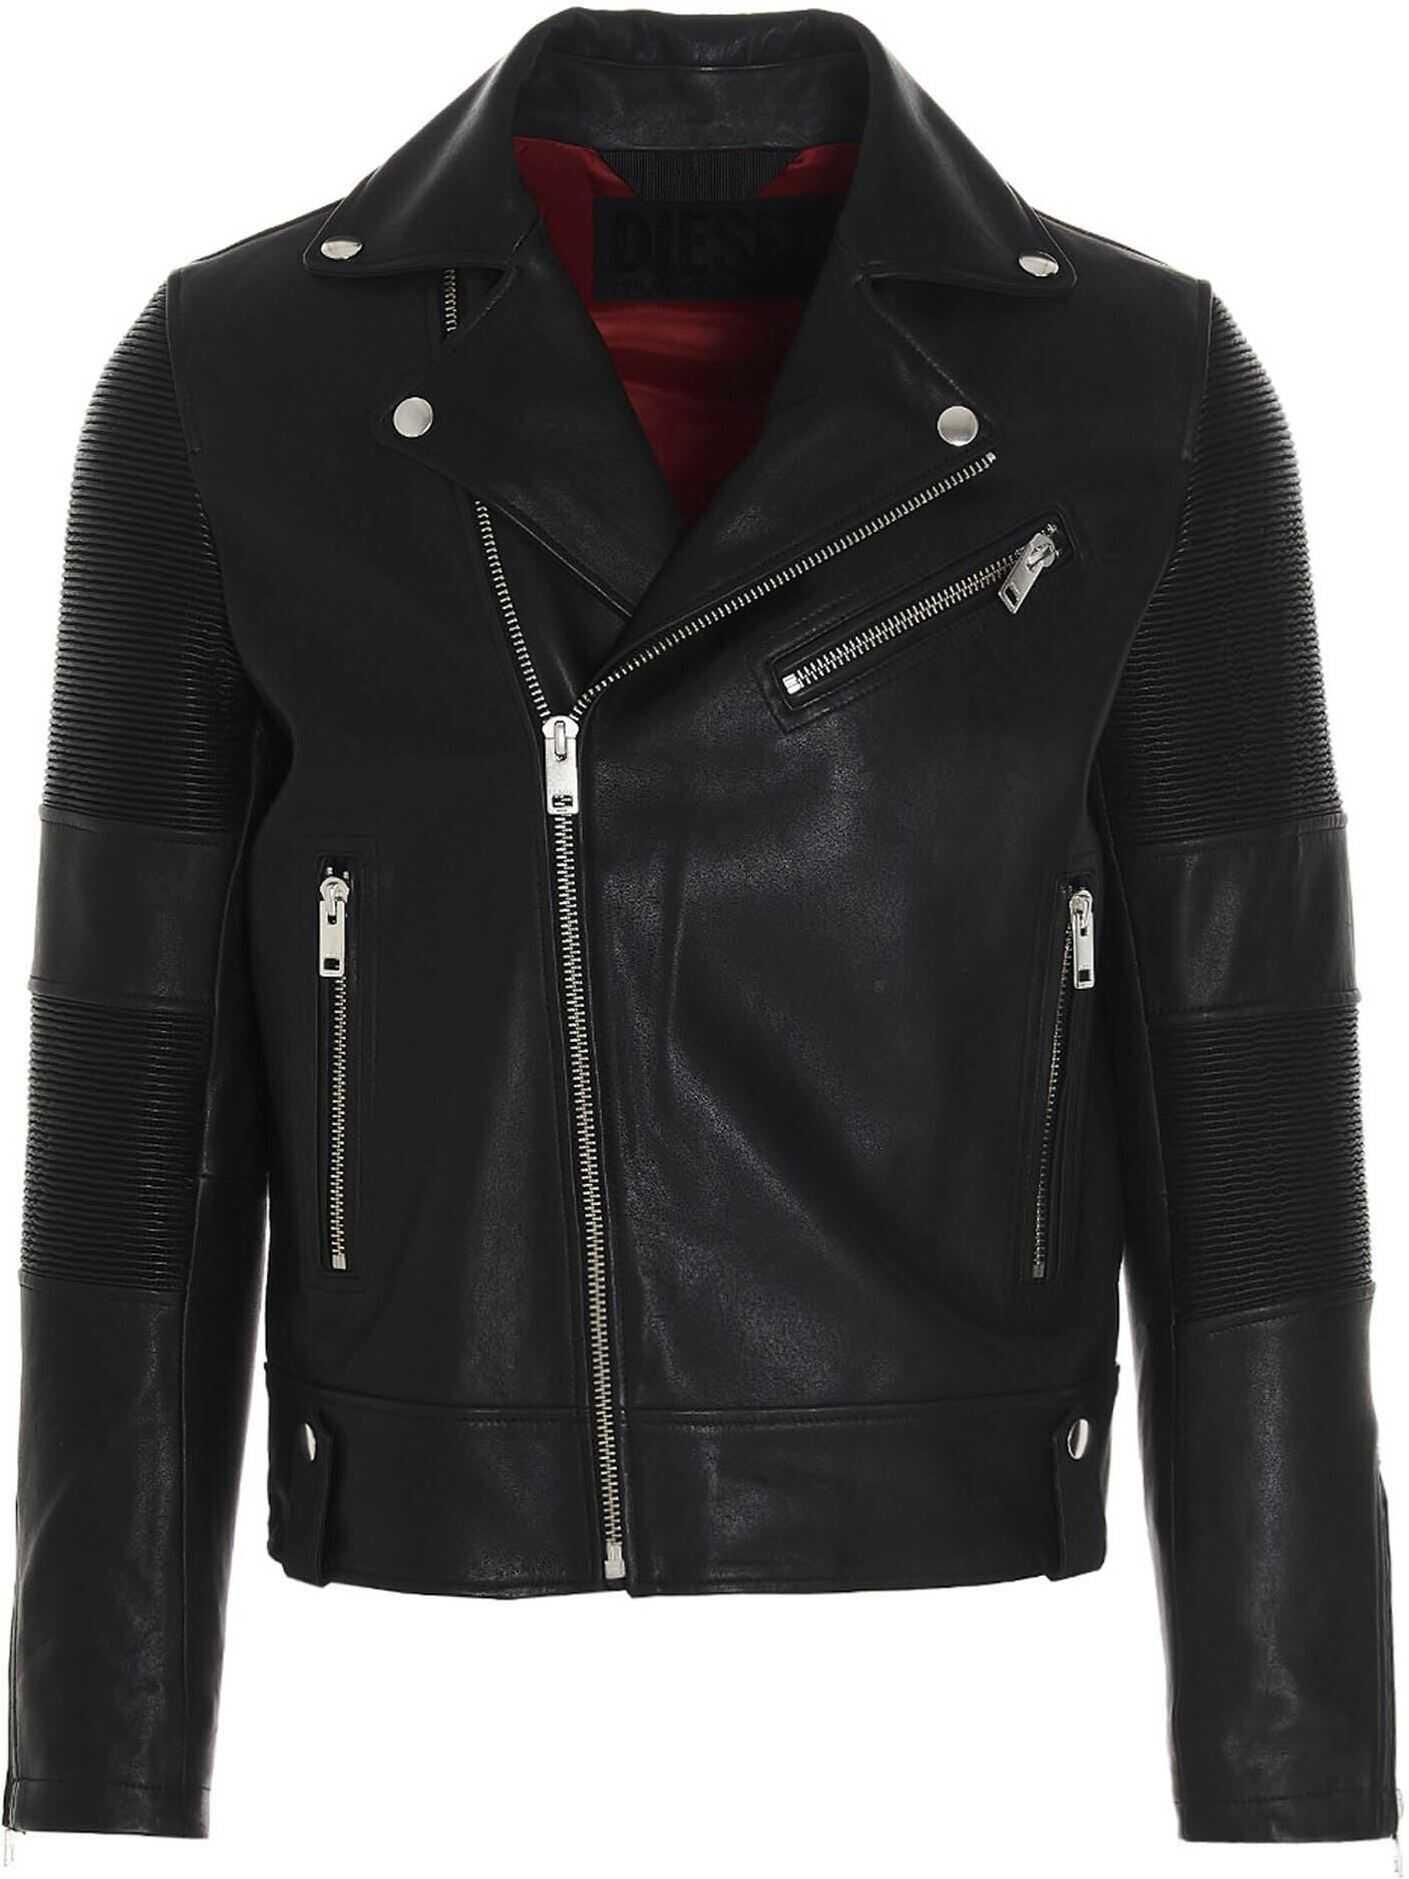 Diesel L-Starkville Leather Jacket In Black Black imagine